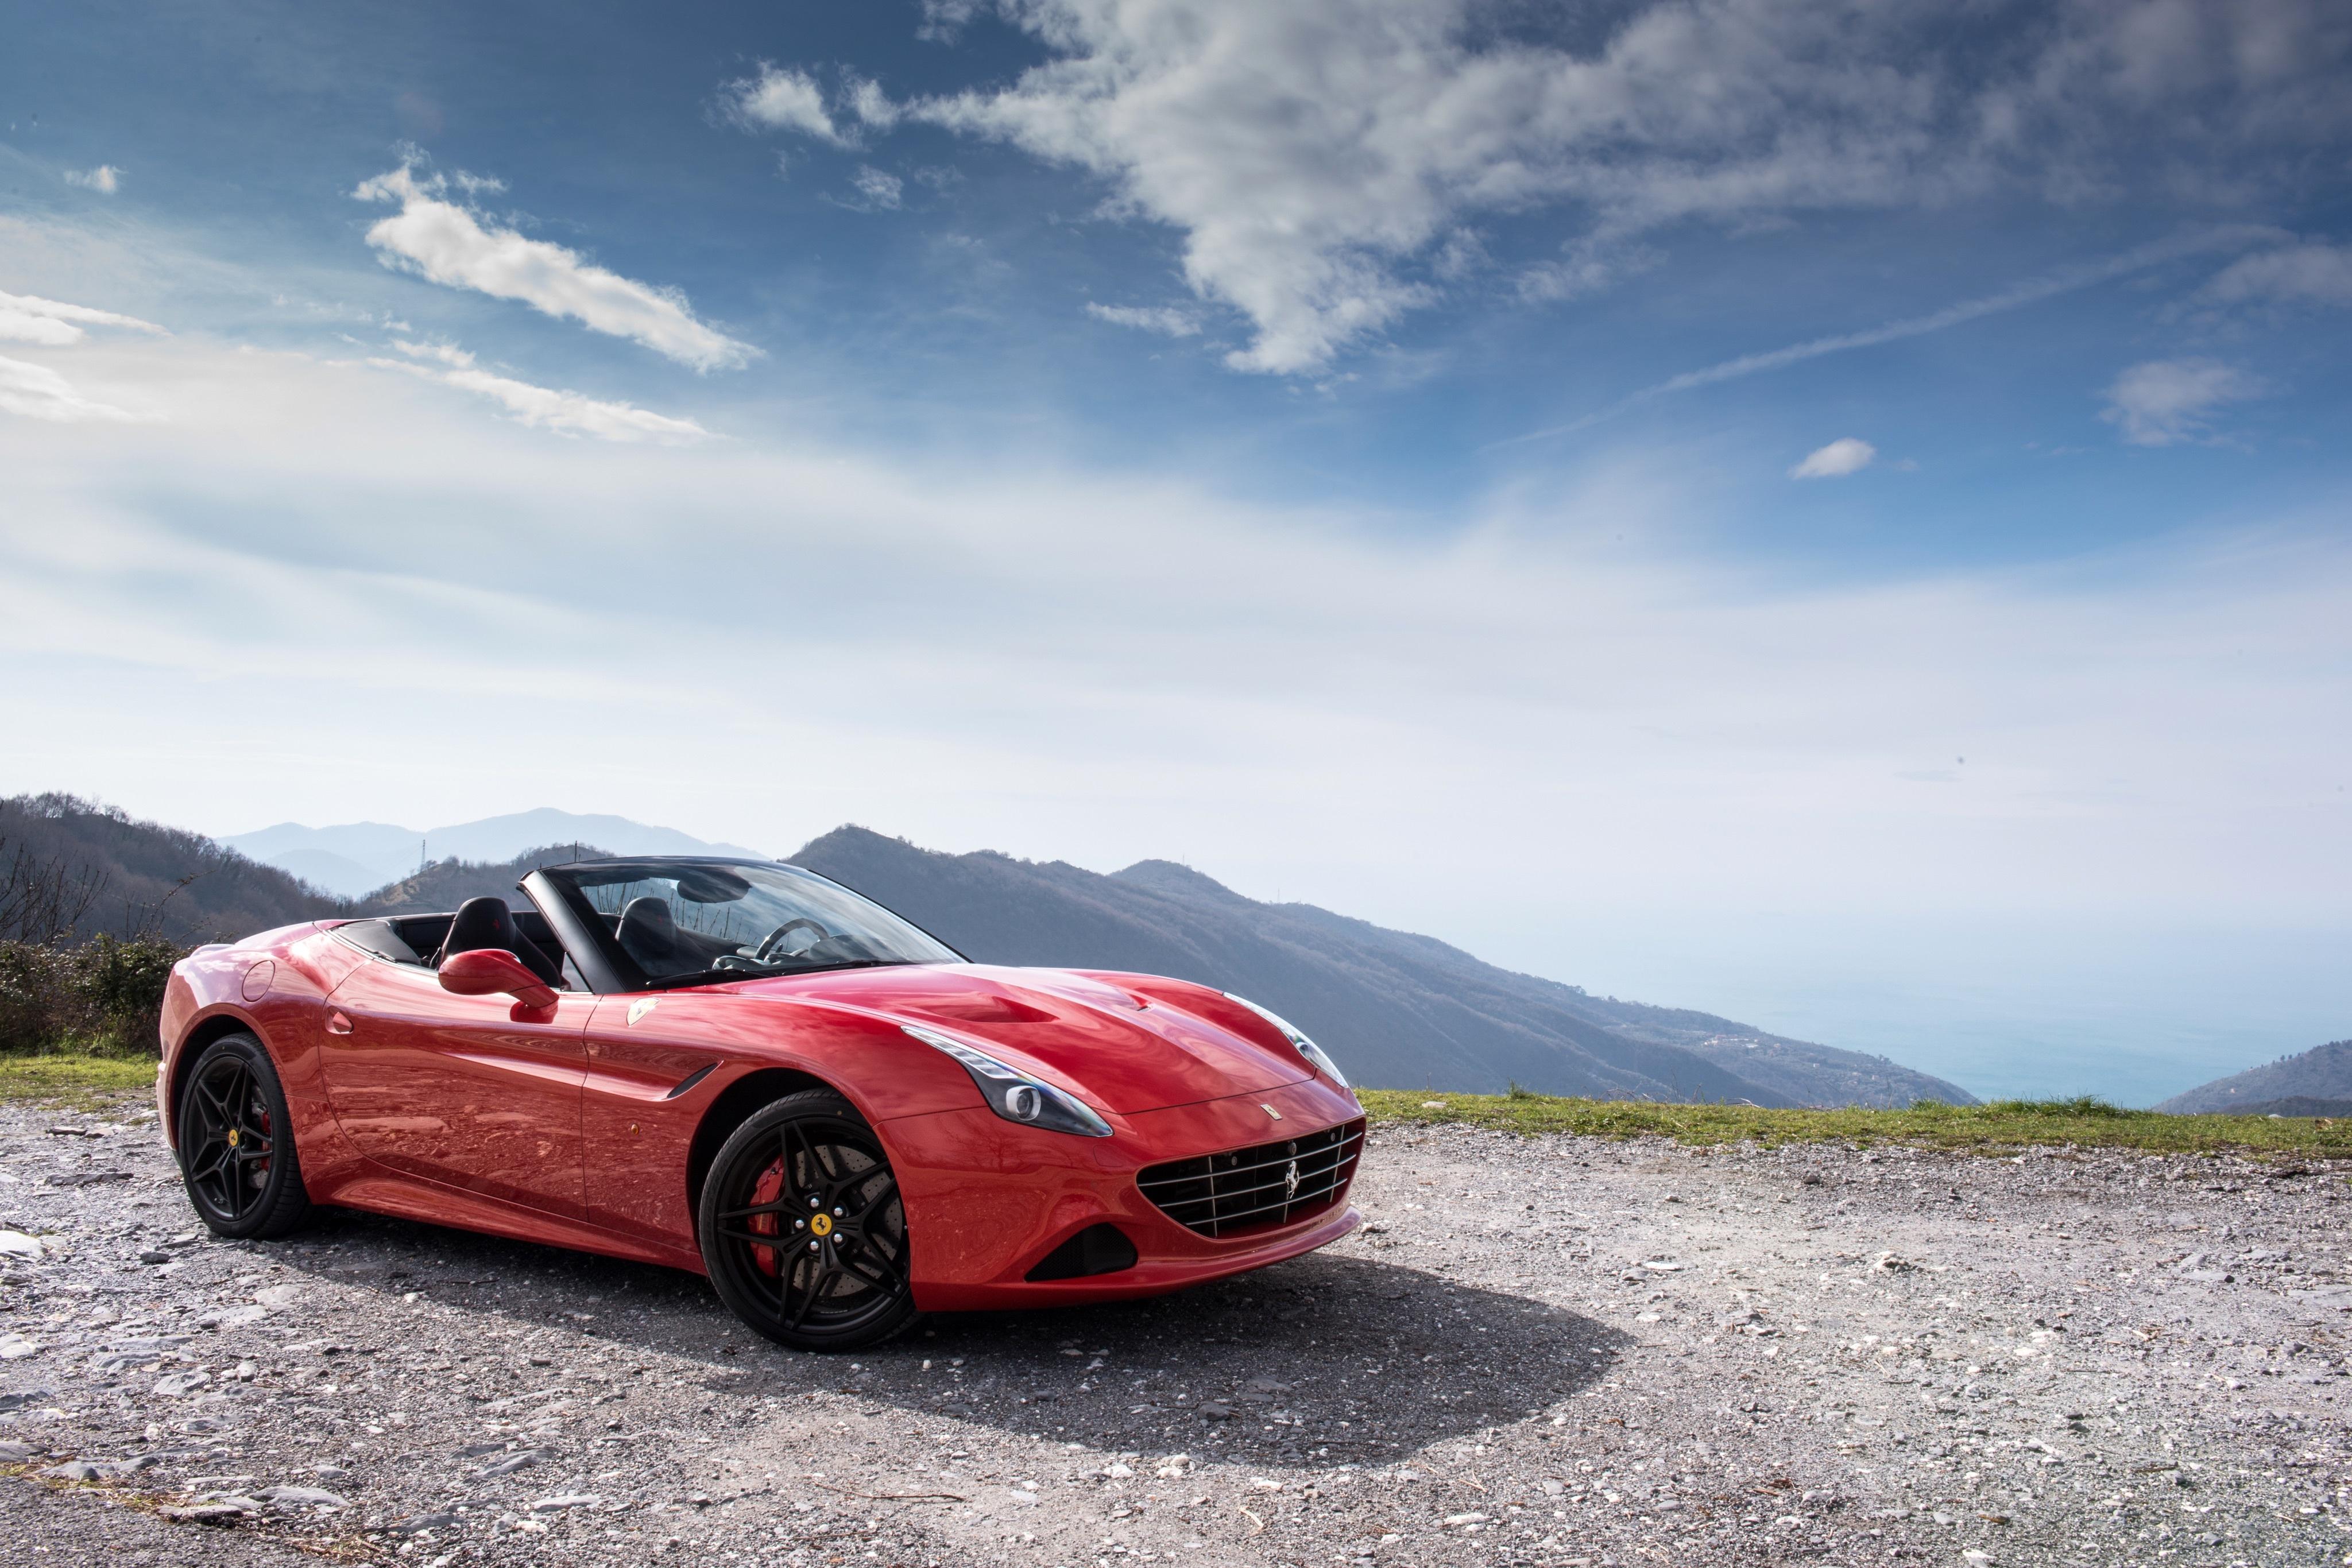 Ferrari California T 4k Ultra HD Wallpaper | Background ...